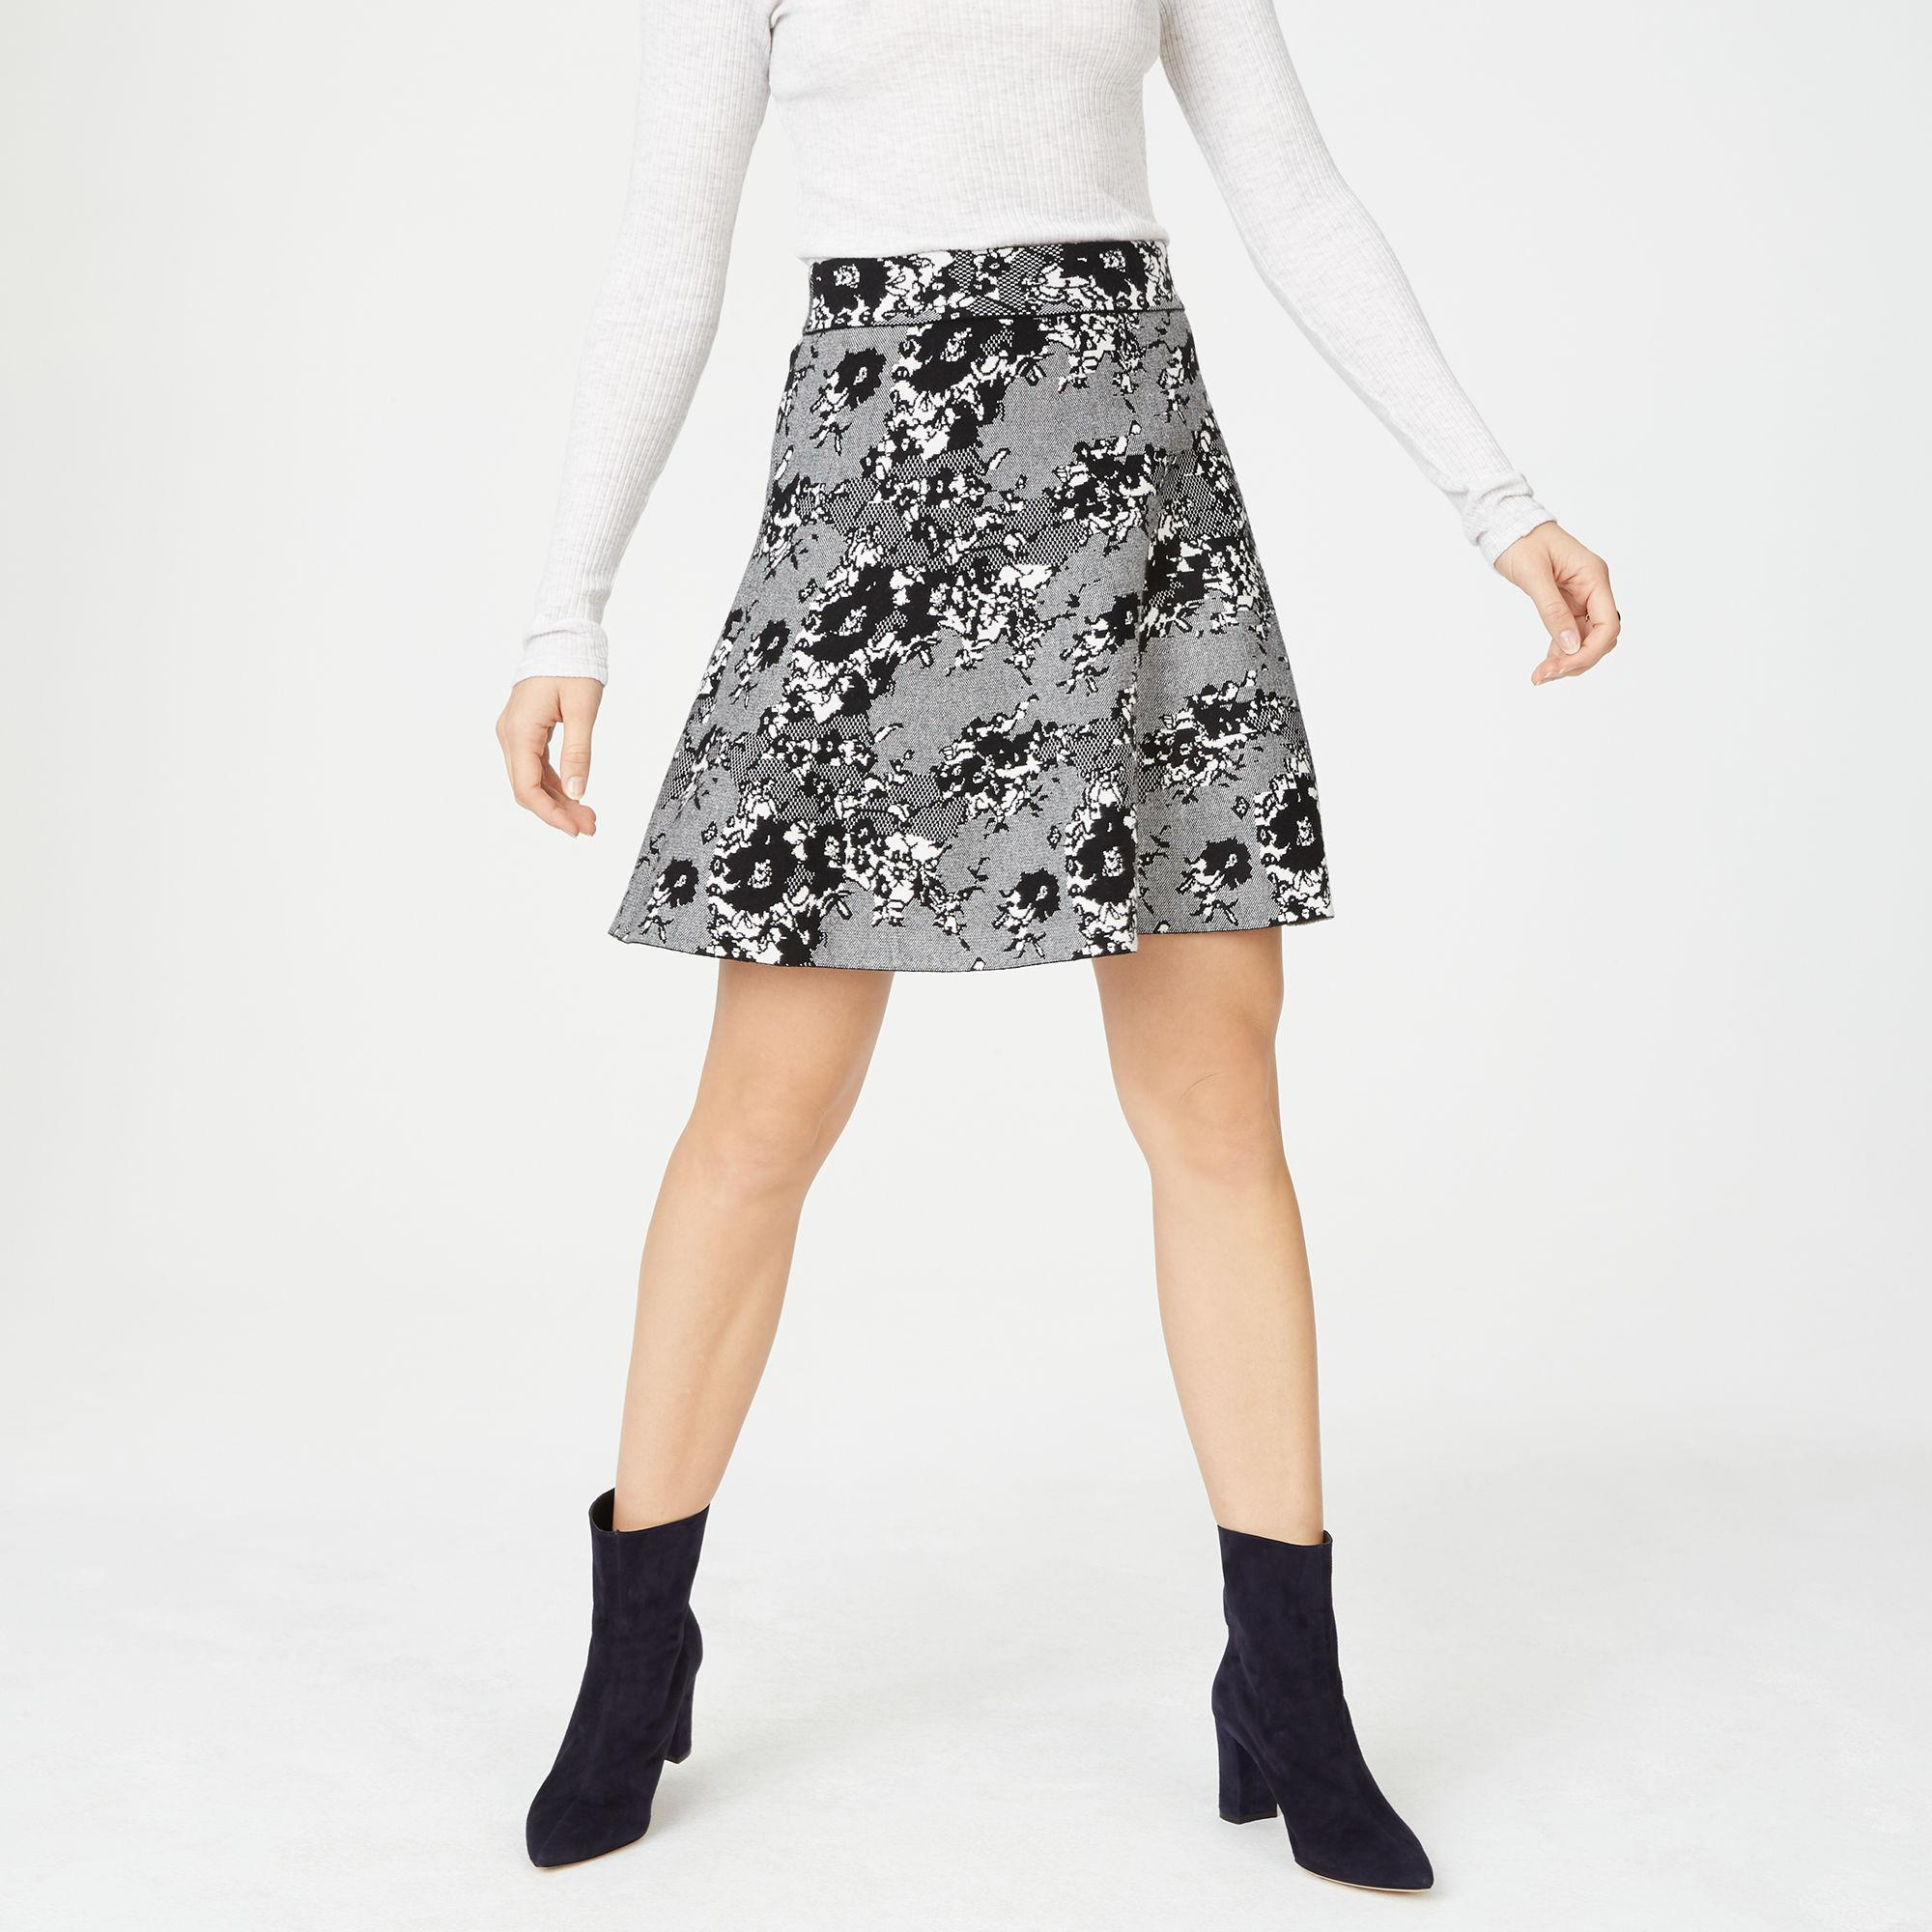 e45405db50 Lyst - Club Monaco Kessi Skirt in Black